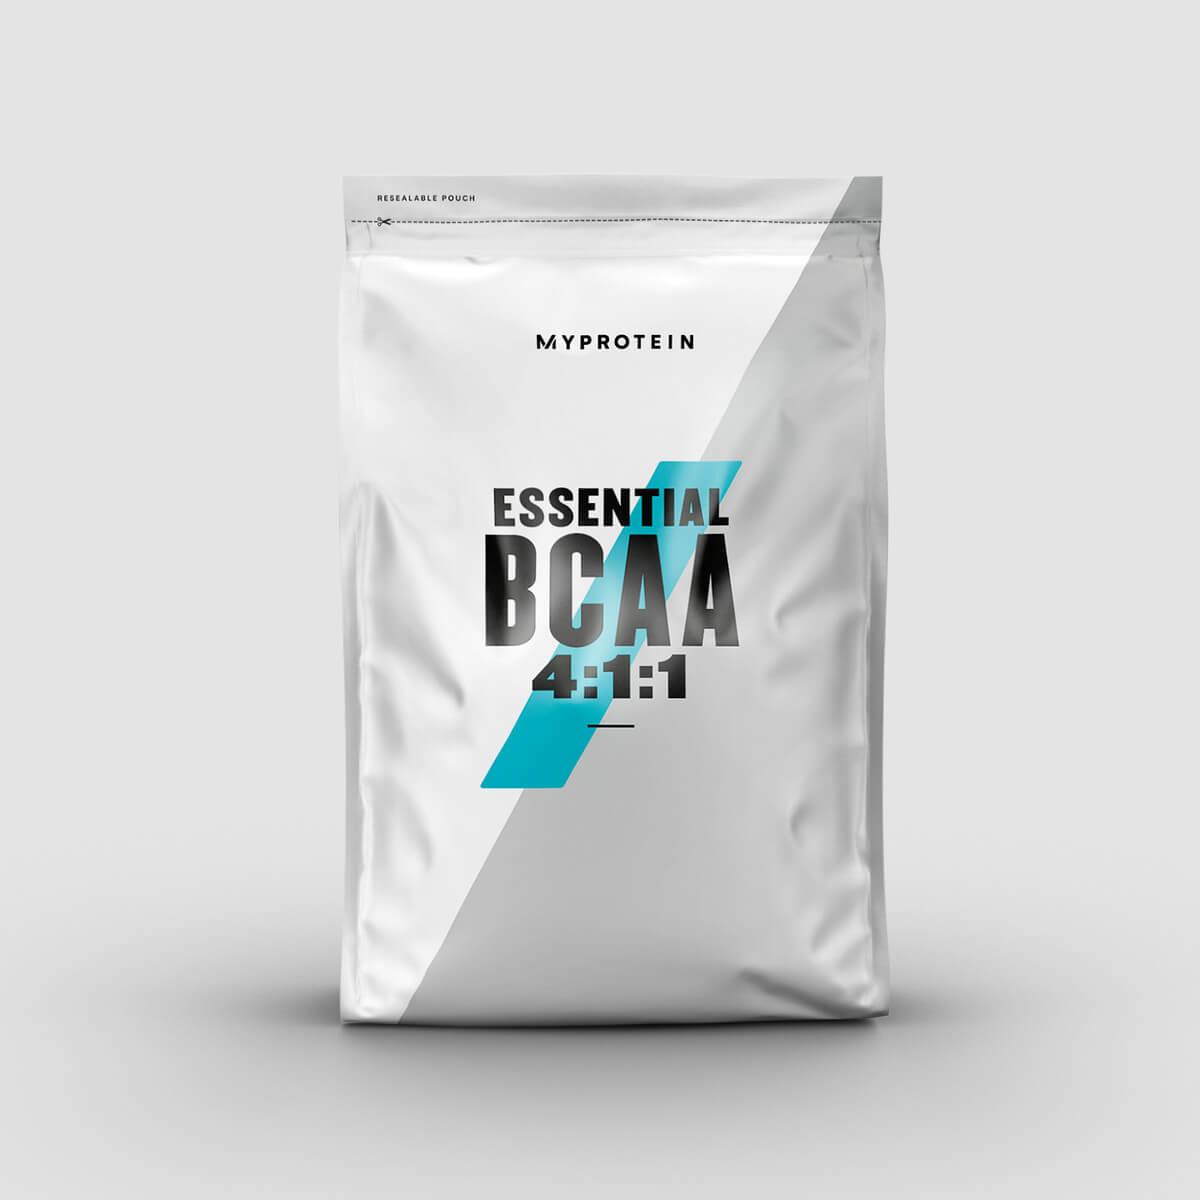 Myprotein Essential BCAA 4:1:1 Powder - 1kg - Tropical